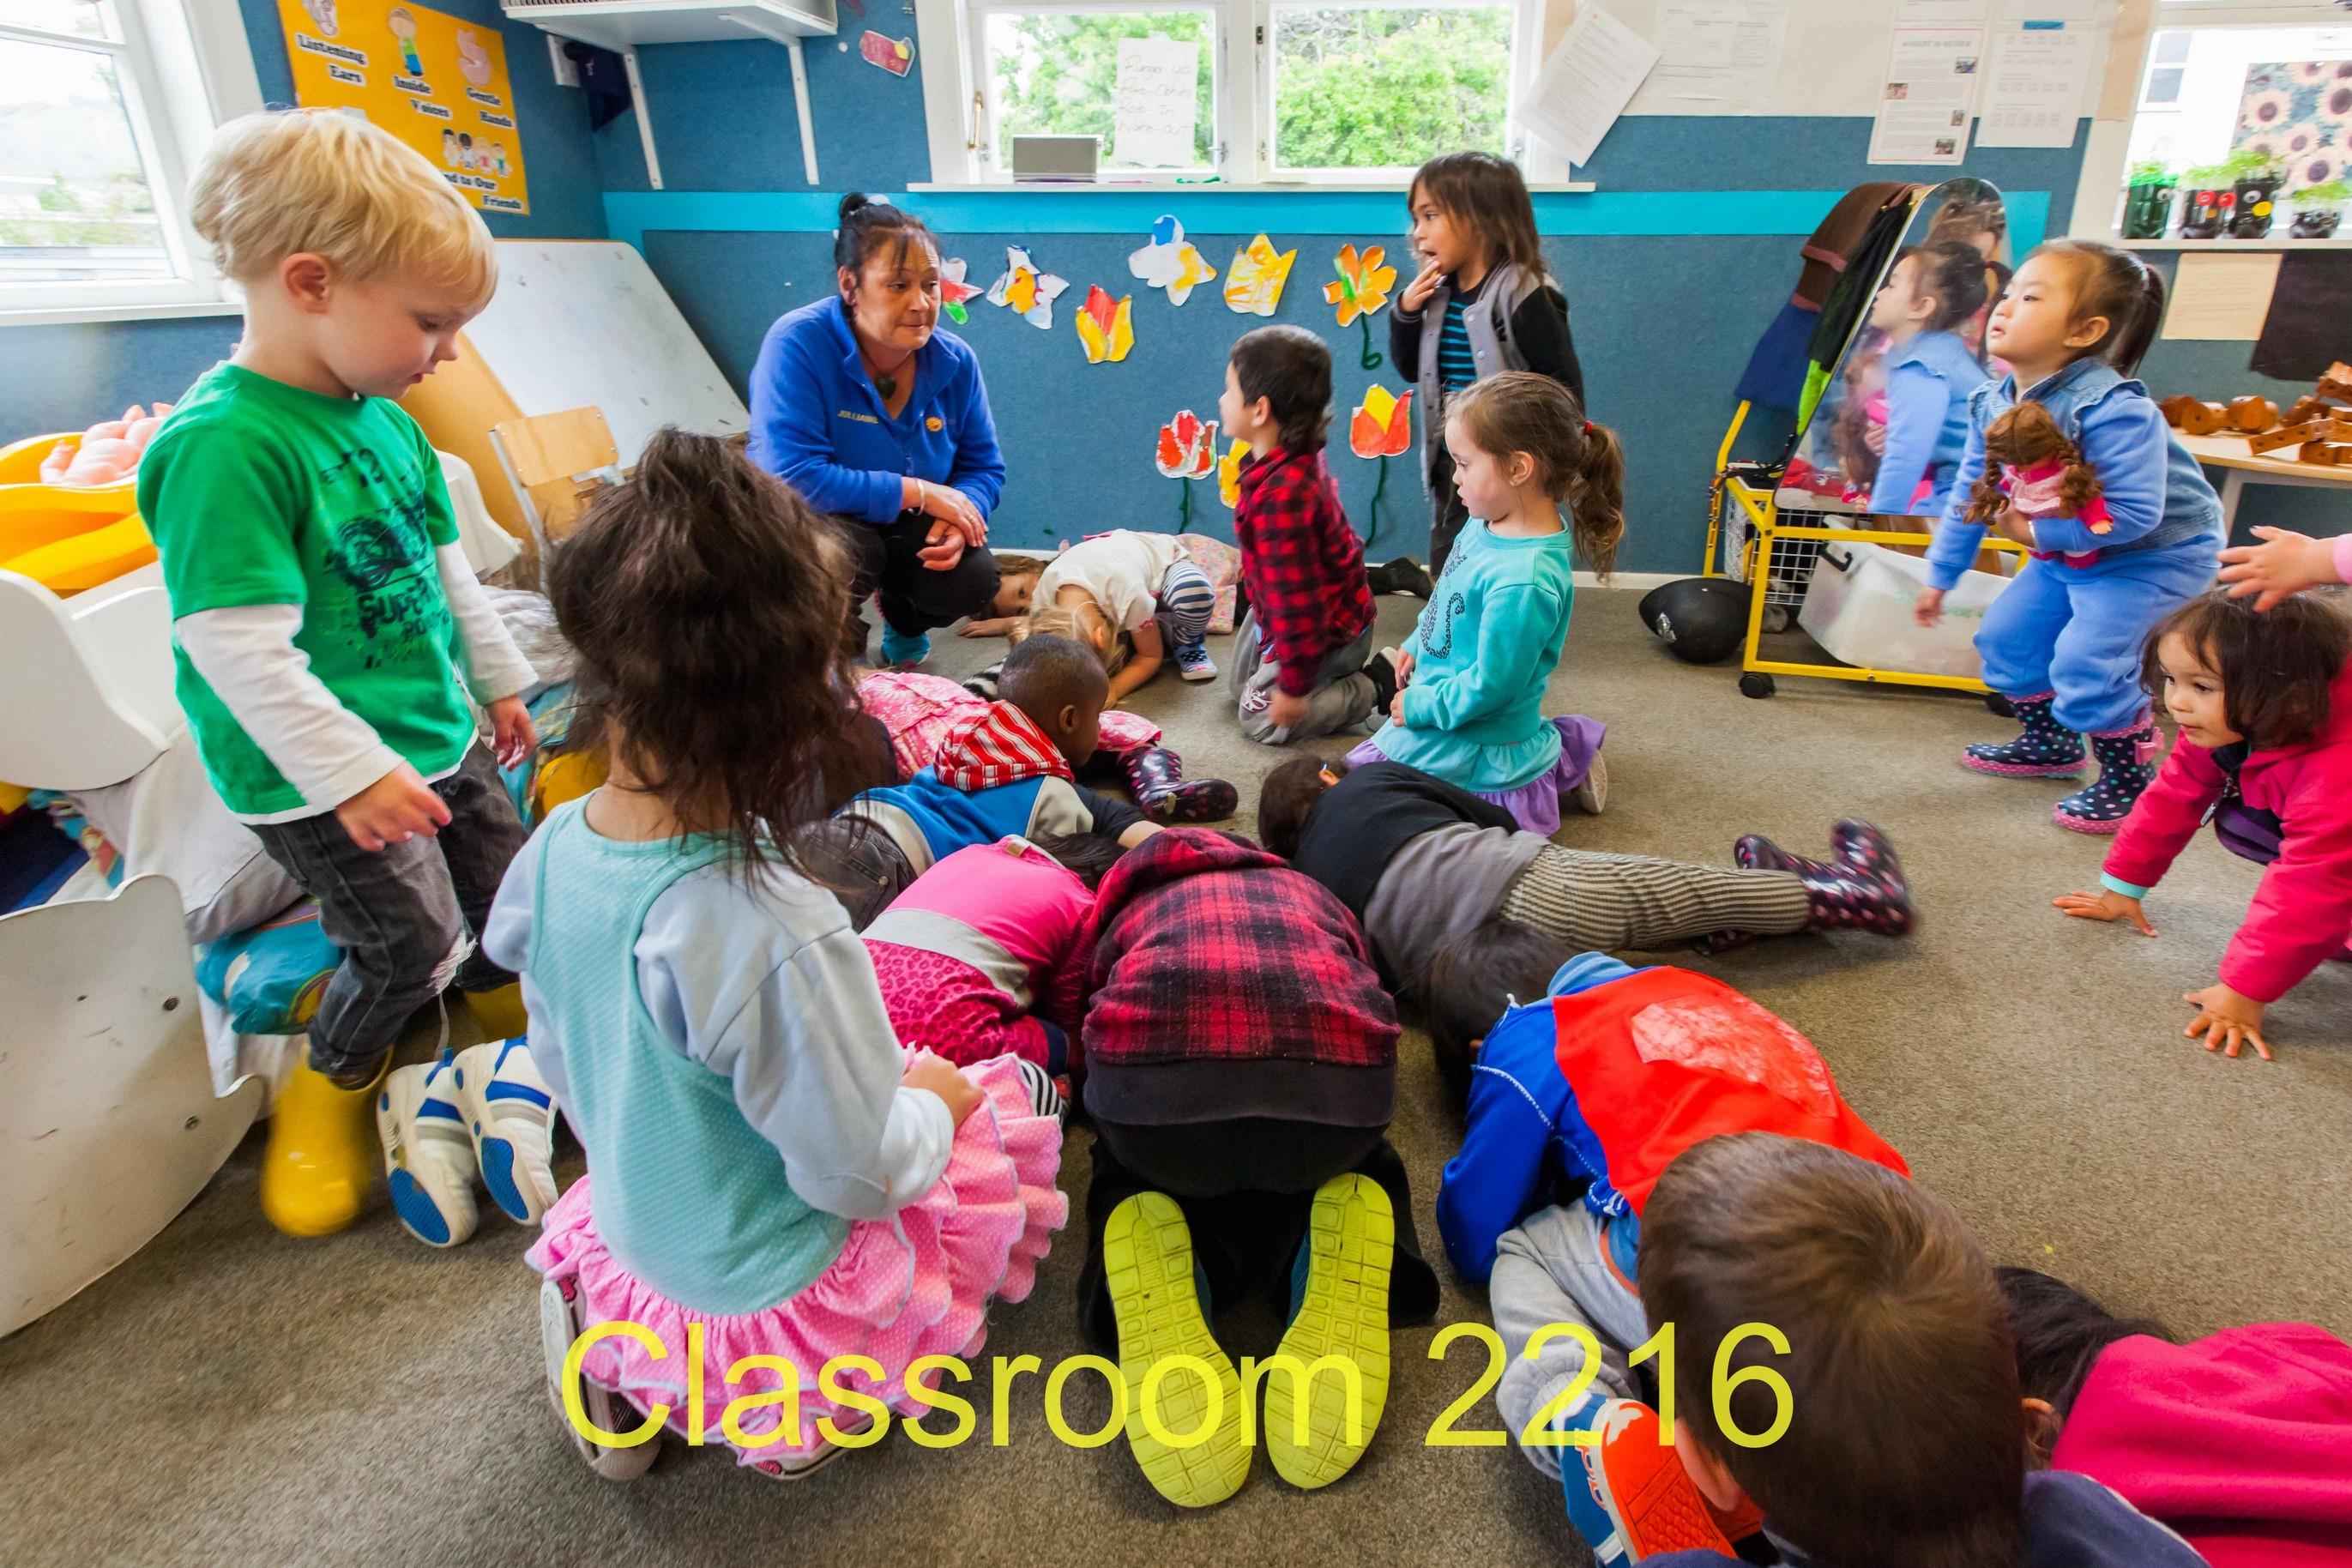 Classroom 2216